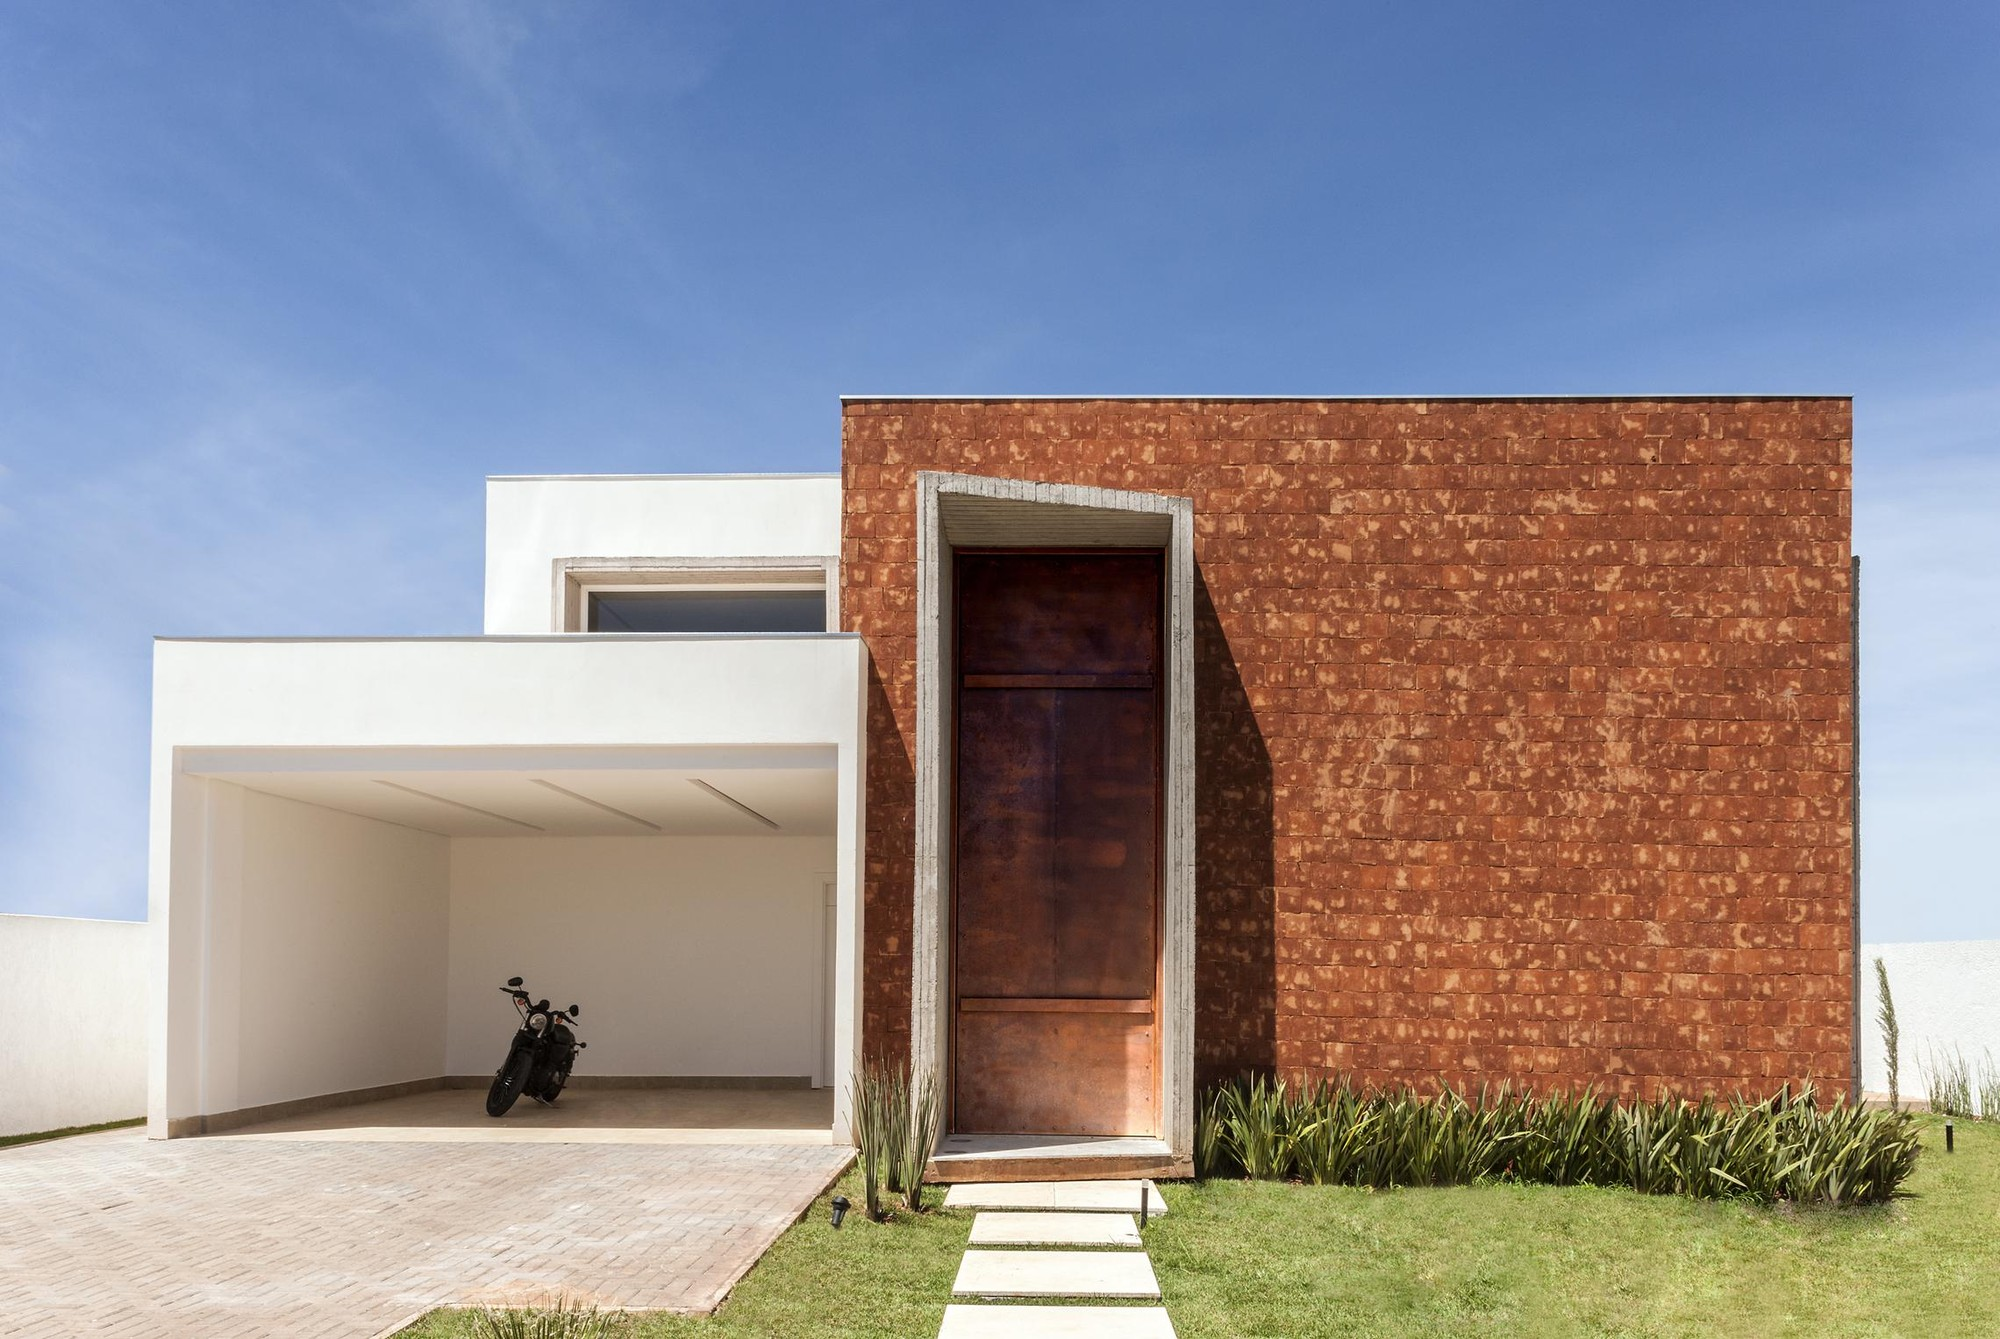 Taquari House / Ney Lima, © Edgard Cesar